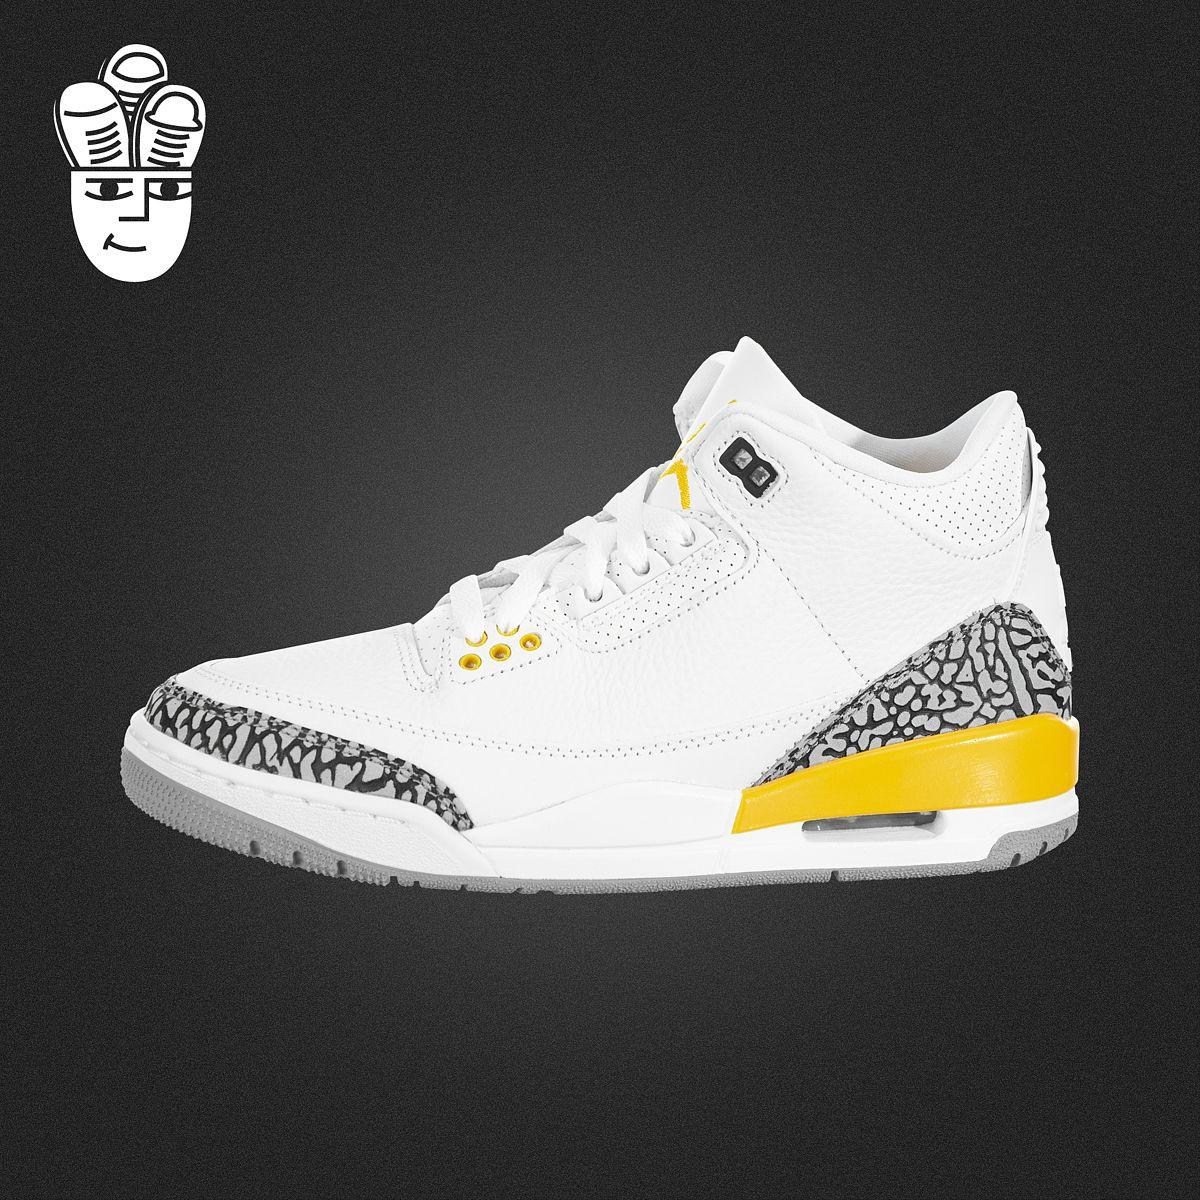 Air Jordan 3 Retro Laser Orange AJ3女鞋 复刻篮球鞋 湖人